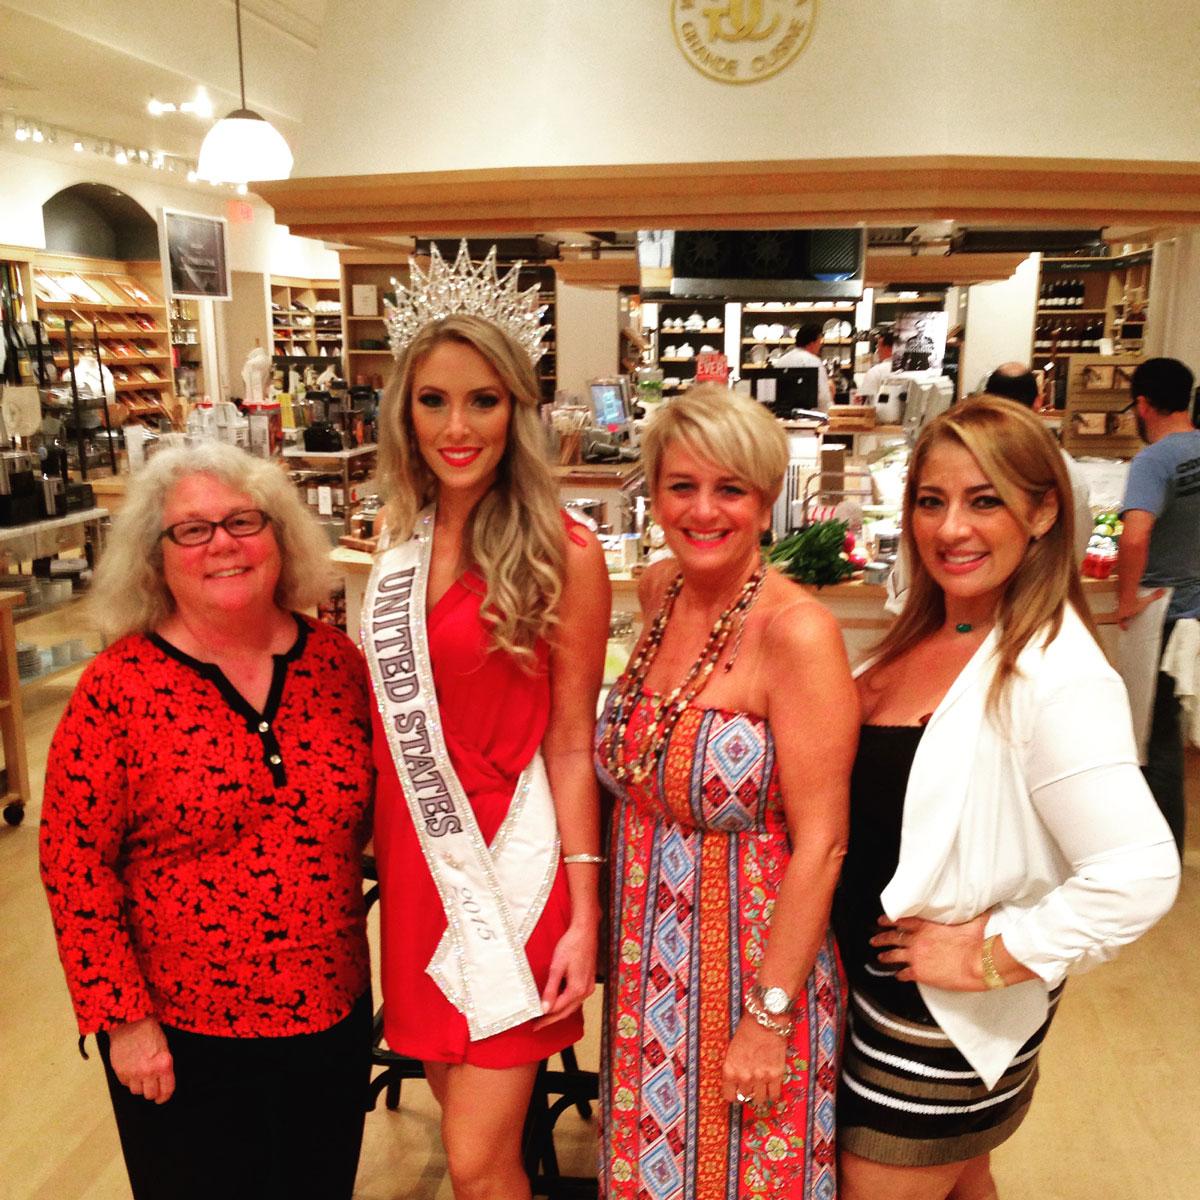 Judges-with-Ms-United-States-2015-Celine-Pelofi-of-Florida